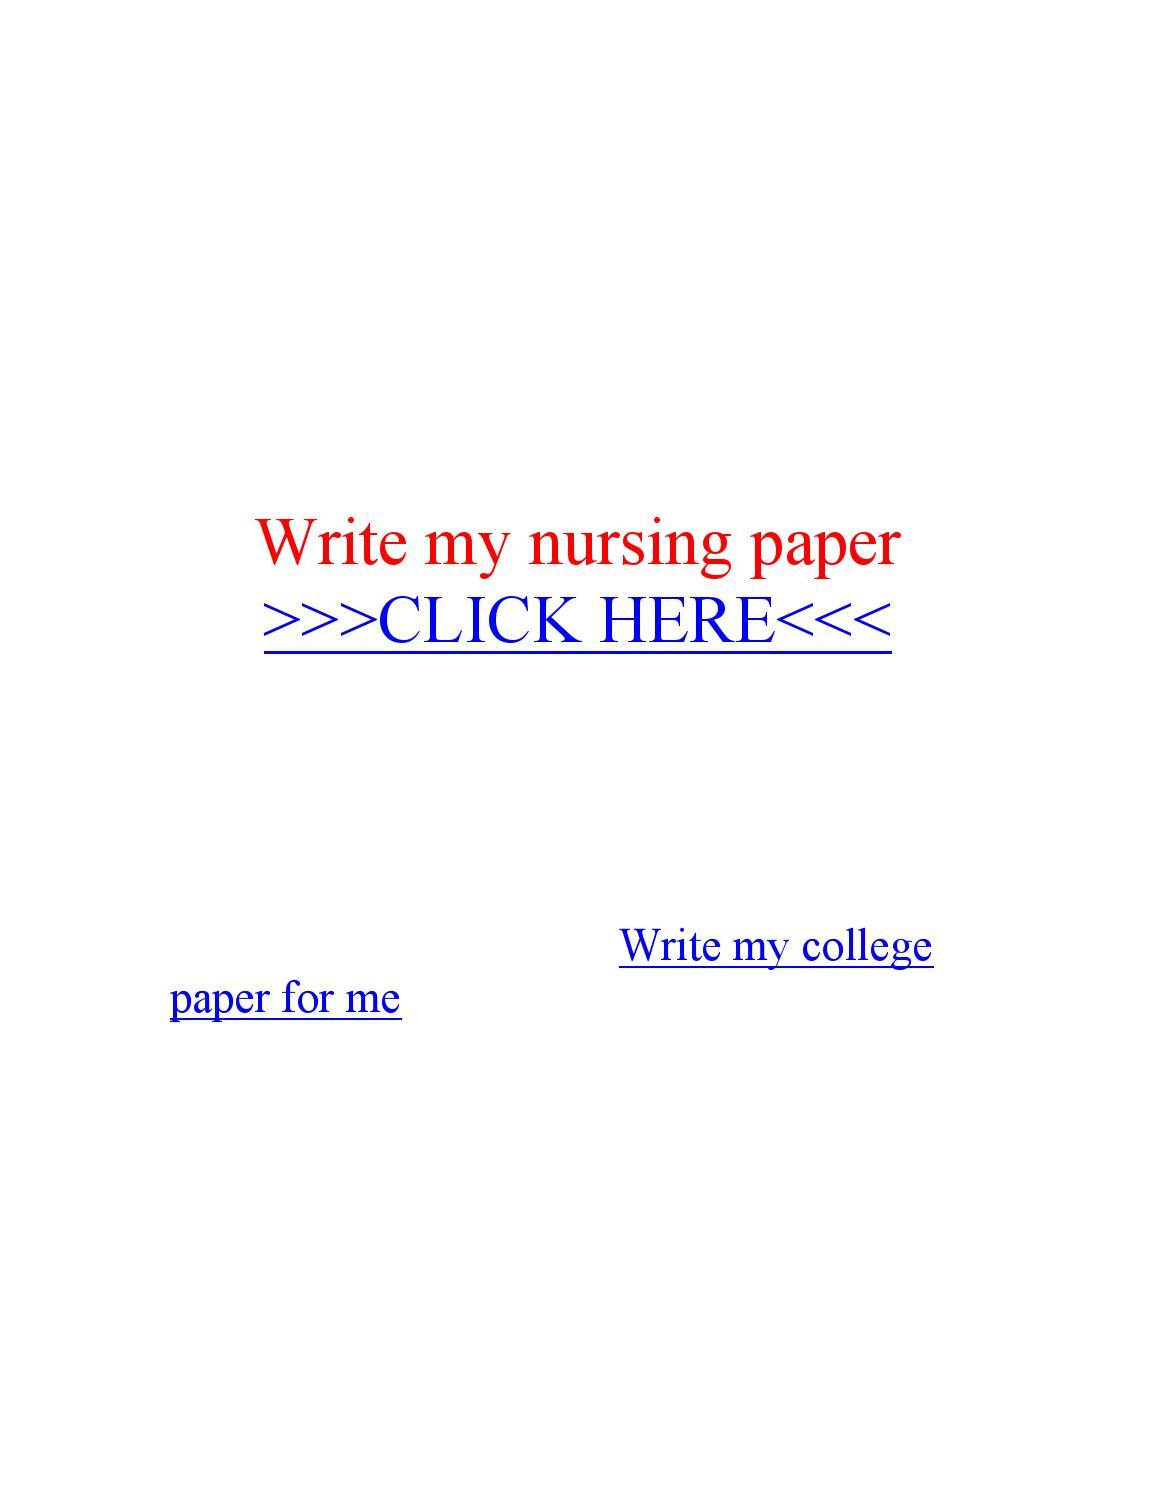 Write my nursing paper processing